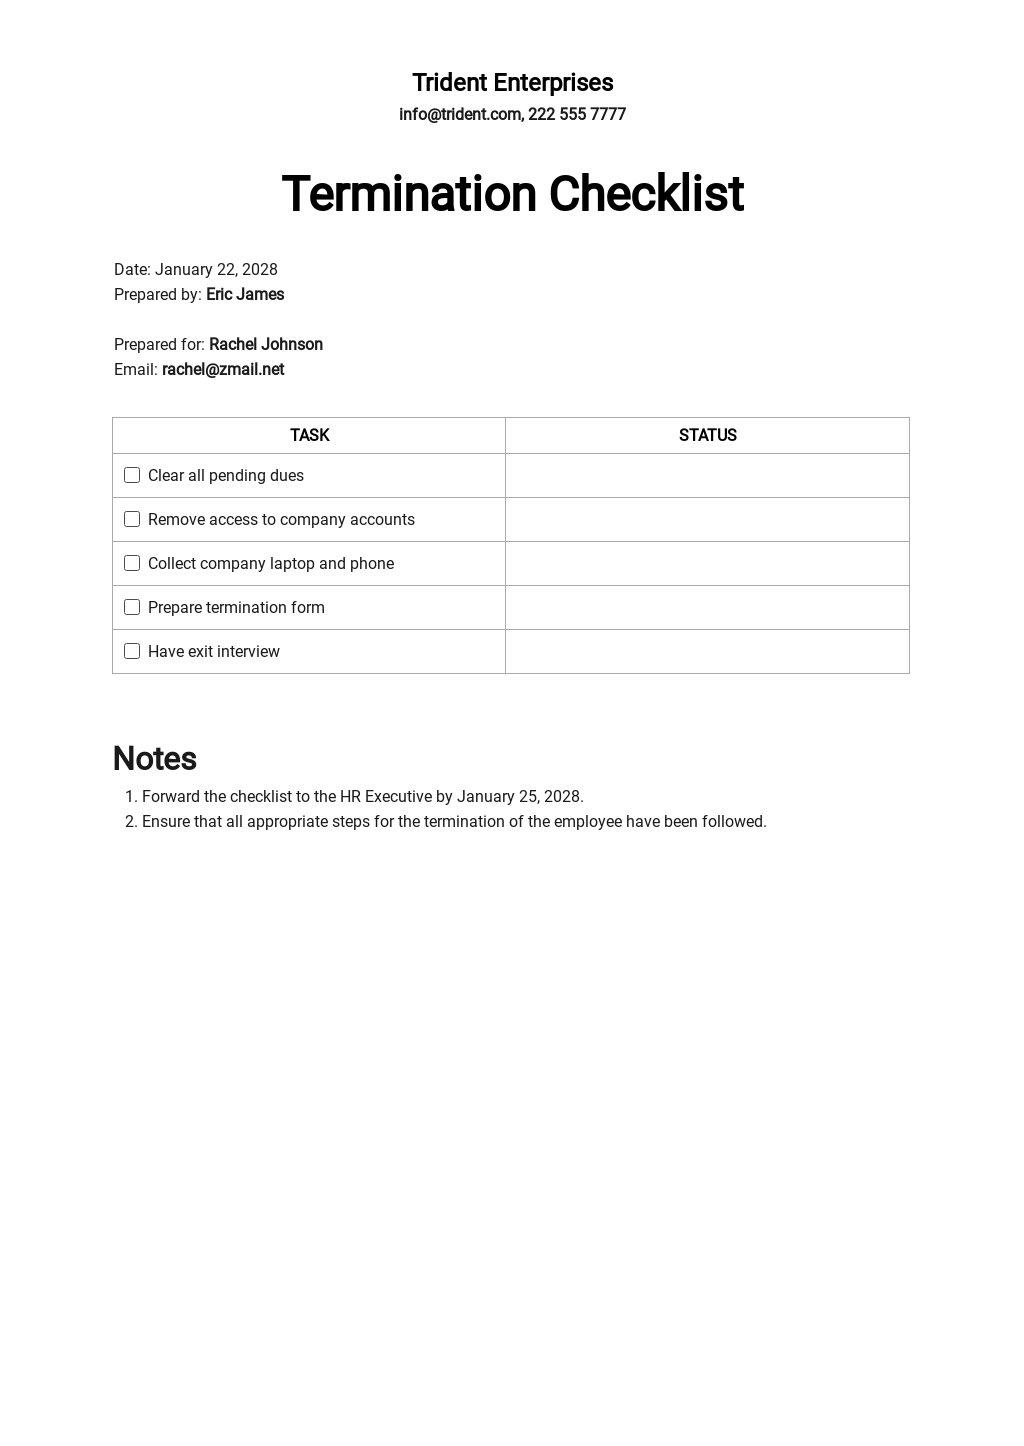 Free Termination Checklist Template.jpe